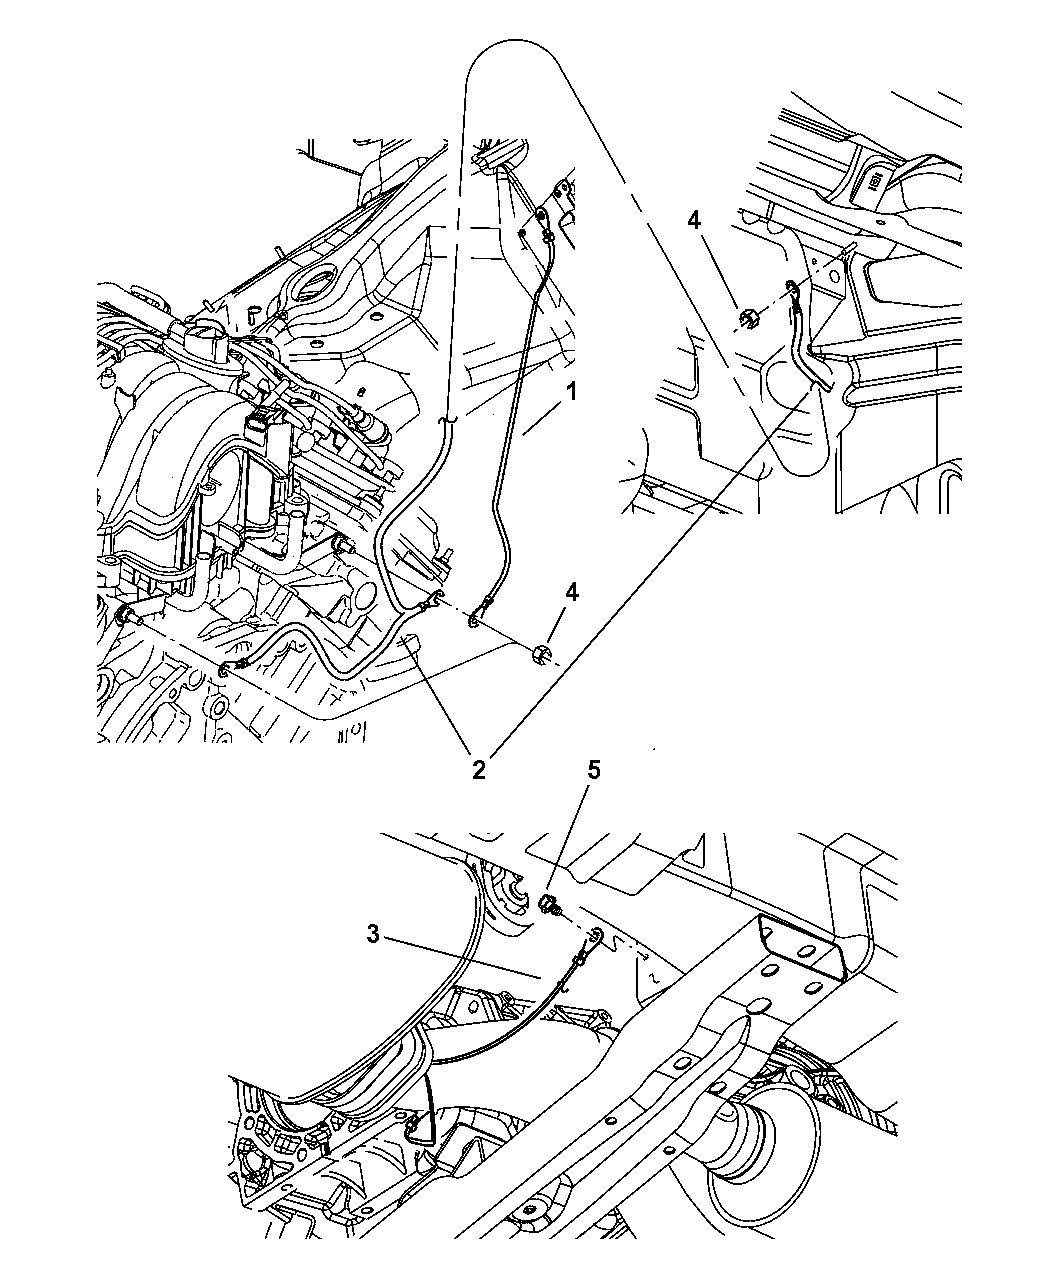 2005 jeep grand cherokee ground straps engine mopar parts giant pinion angle diagram 2005 jeep grand cherokee ground straps engine